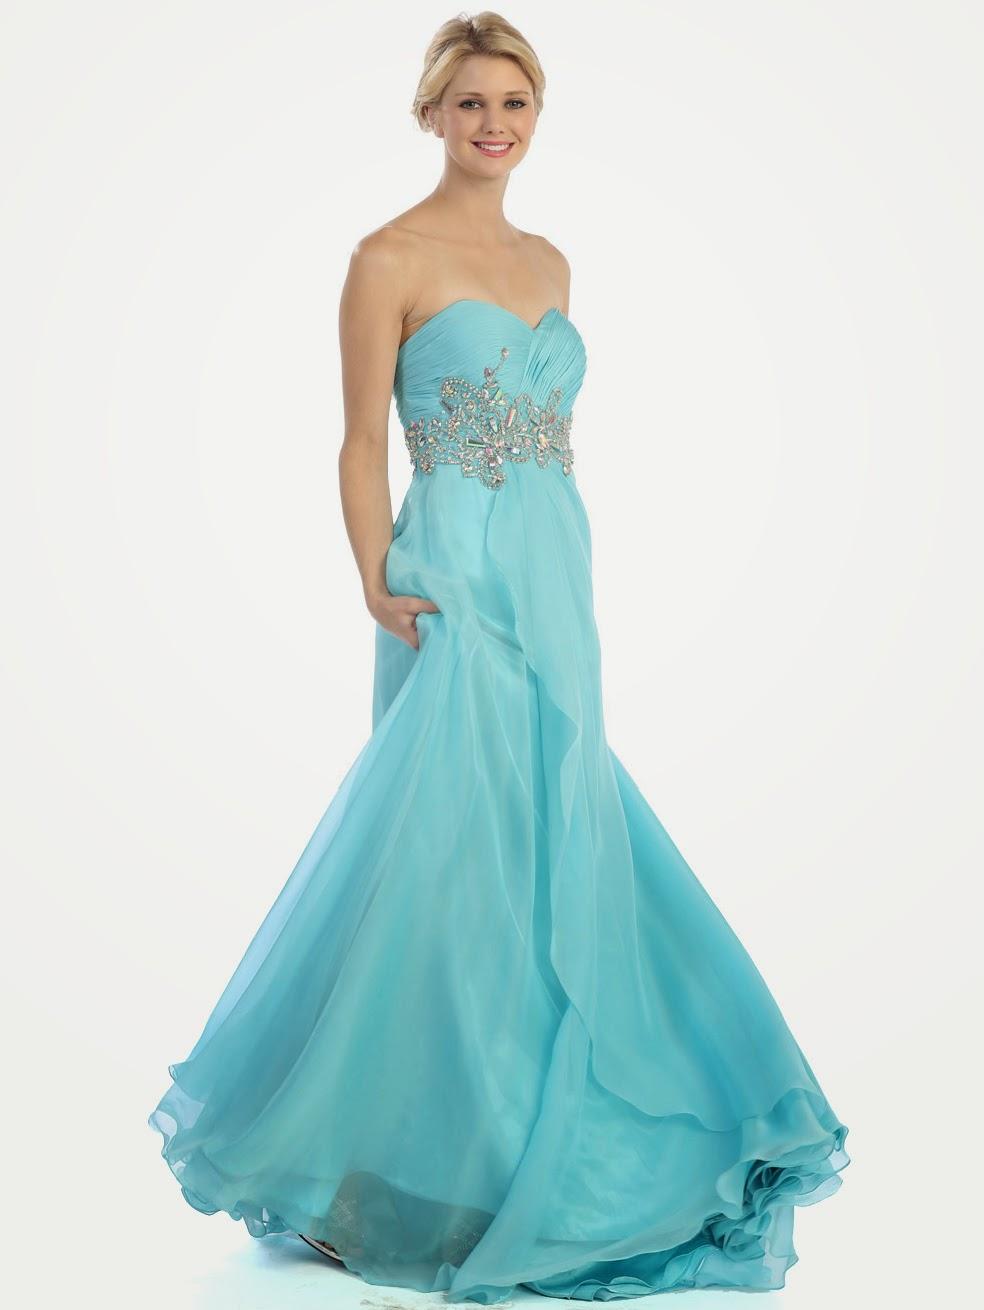 The Perfect Prom Dress - Kimono Dress